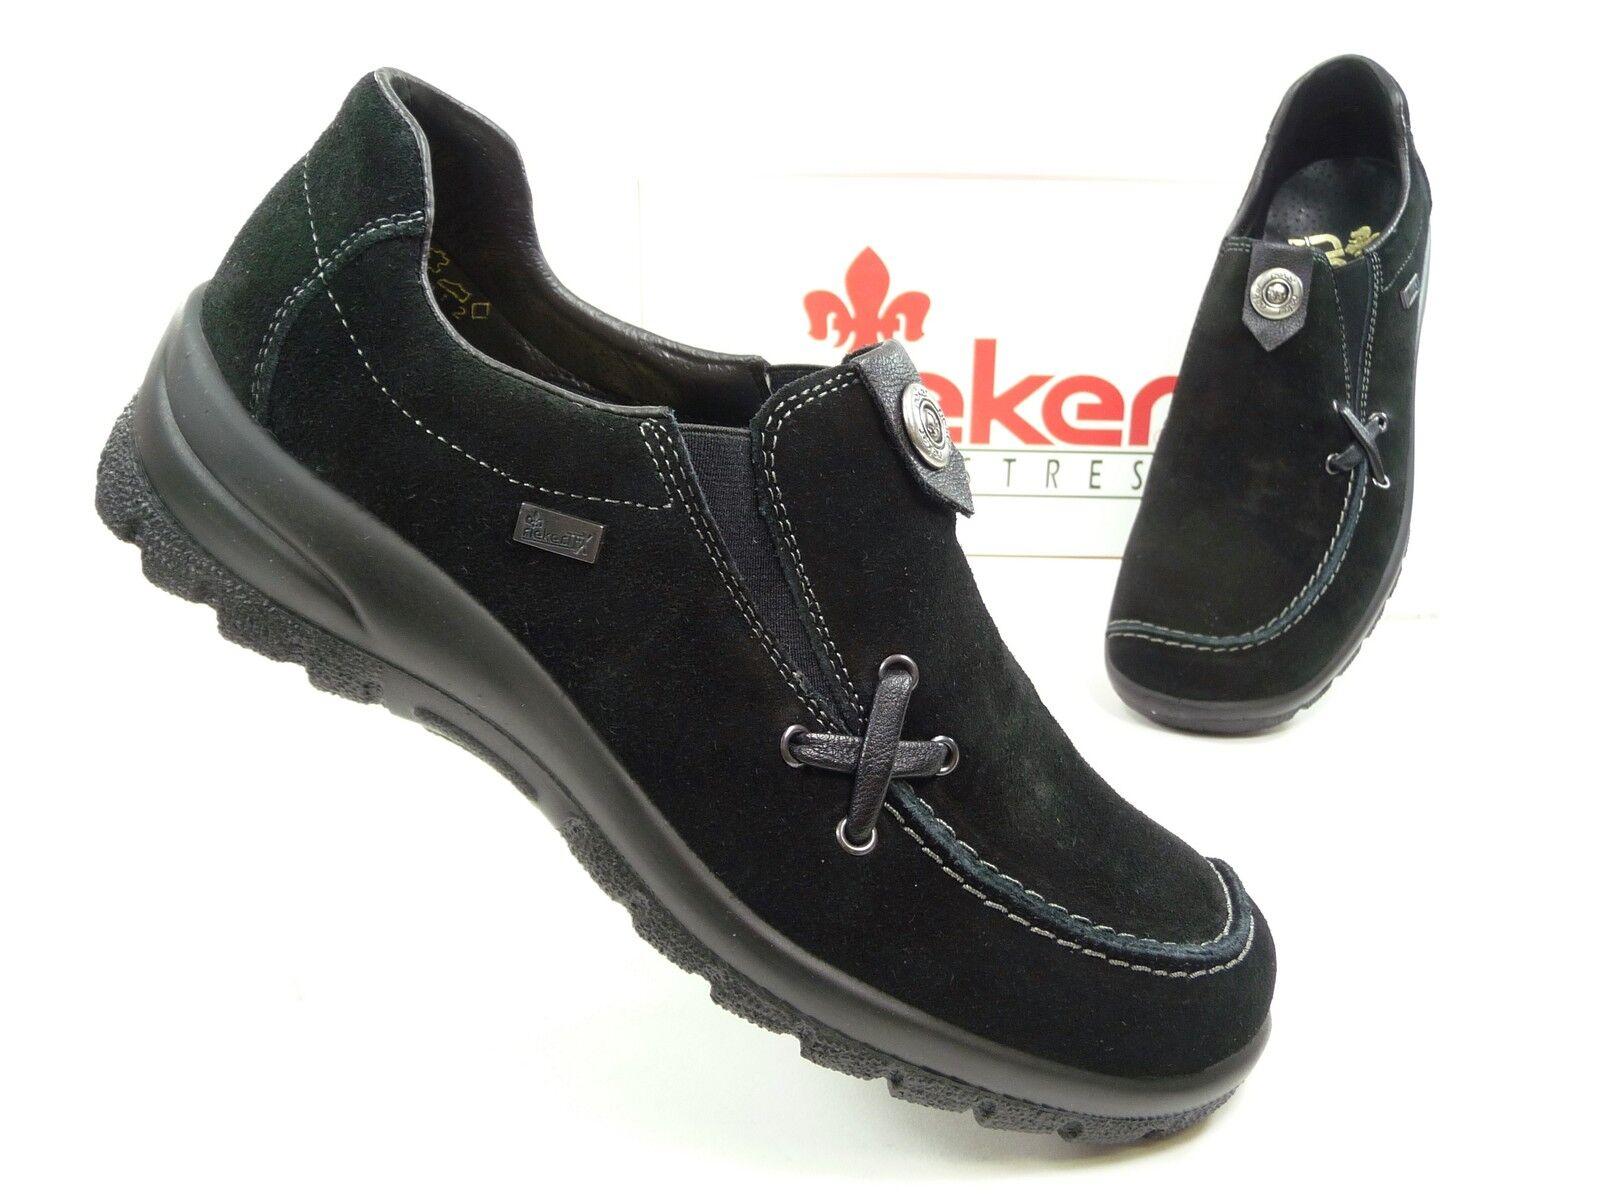 Rieker Tex Damen Schuhe Halbschuhe Slipper in Schwarz (Art.Nr. L7154-00)